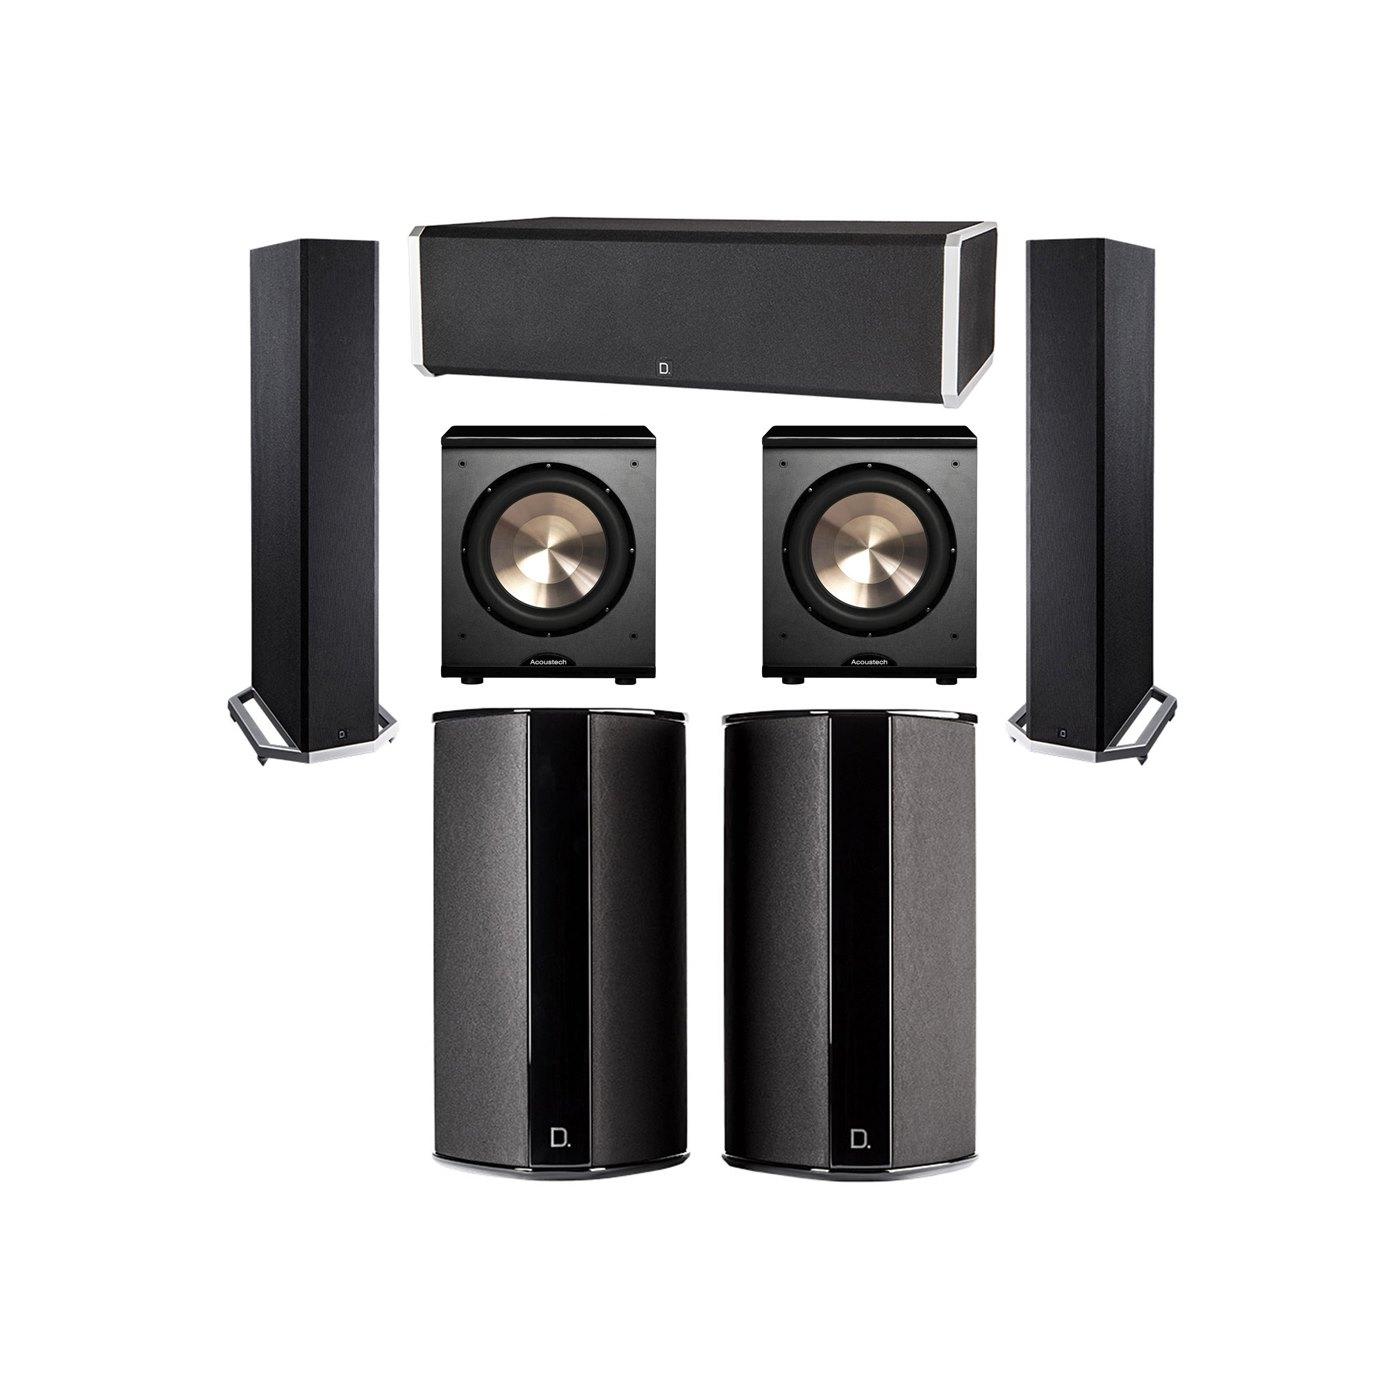 Definitive Technology 5.2 System with 2 BP9020 Tower Speakers, 1 CS9060 Center Channel Speaker, 2 SR9080 Surround Speaker, 2 BIC PL-200 Subwoofer